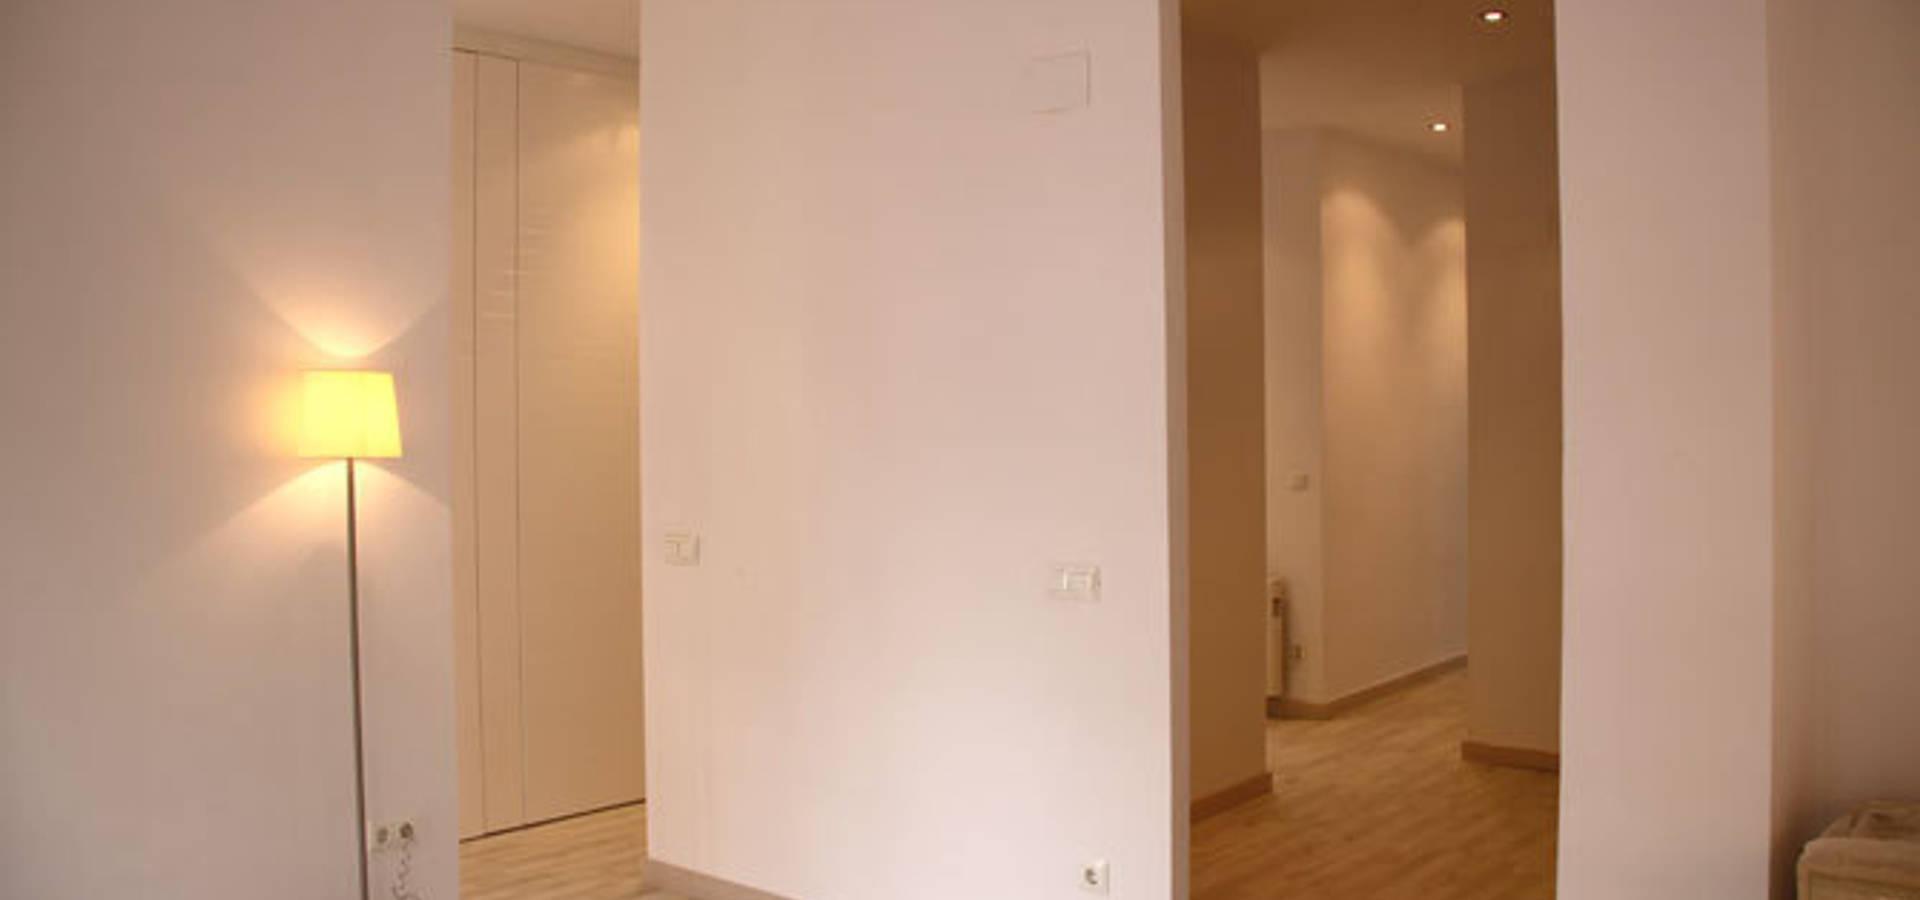 Decoradores De Interiores En Valencia. Proyectos Baratos De ...